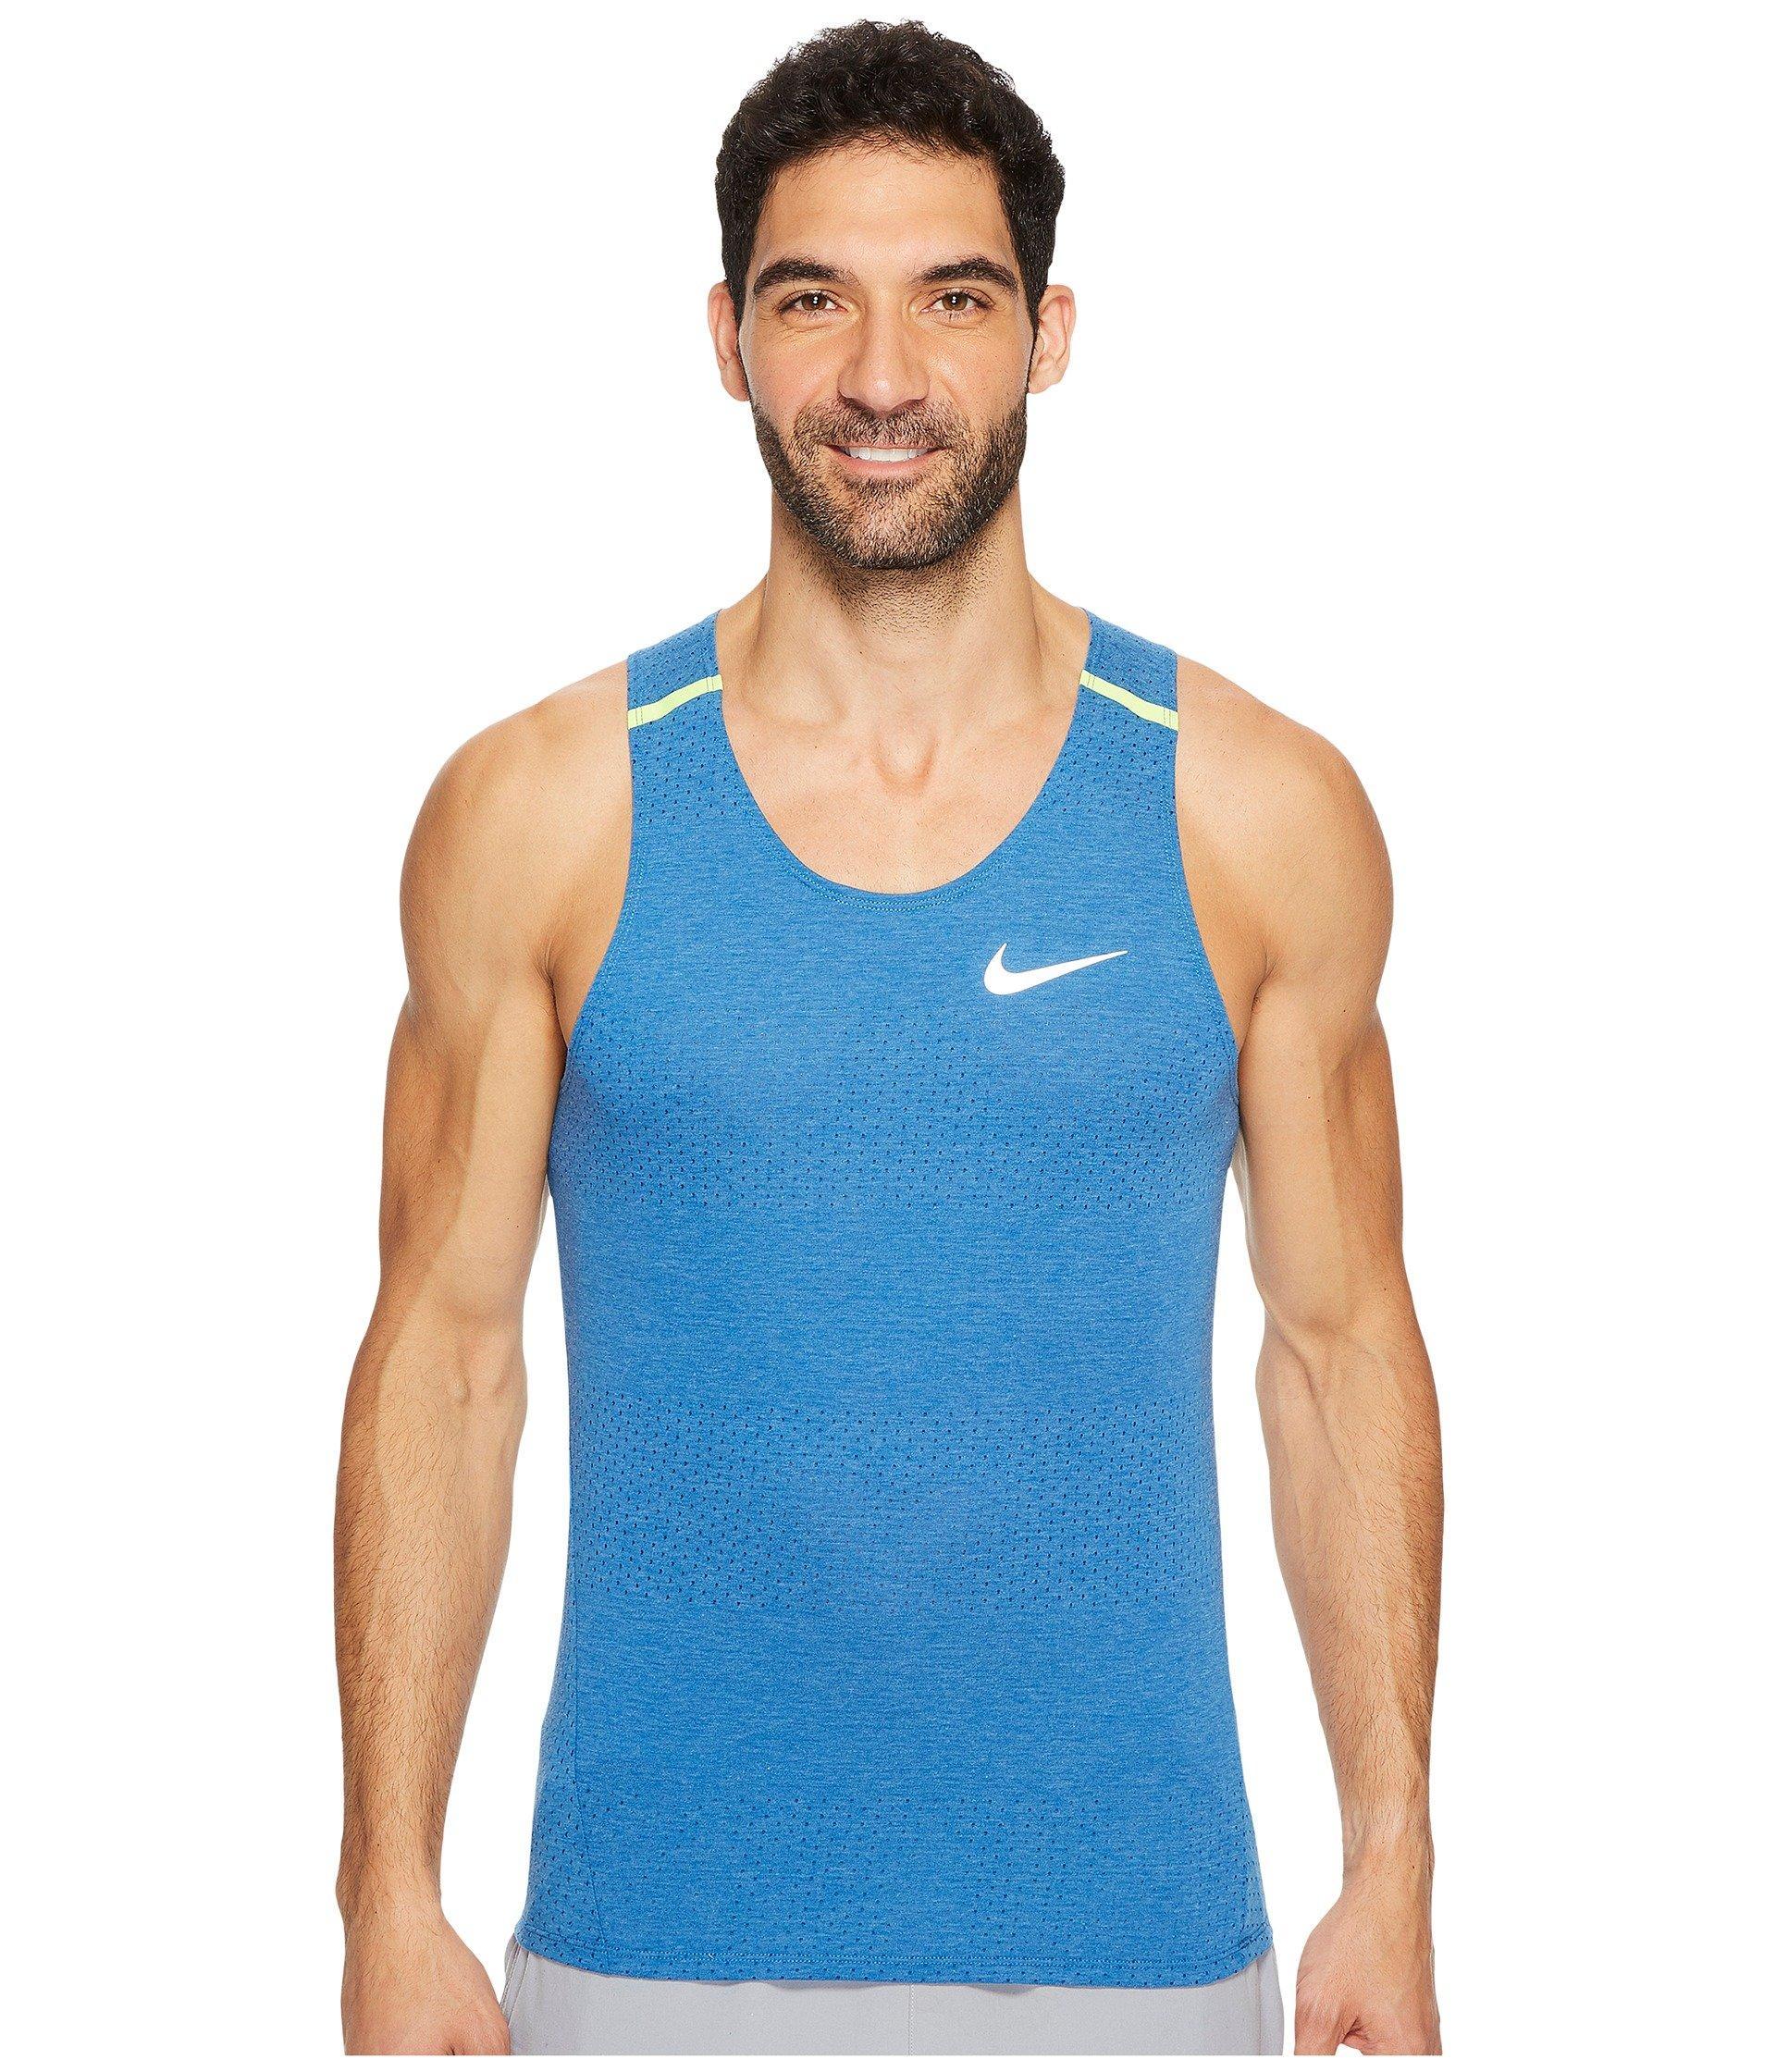 Nike Breathe Running Tank In Blue Jay/heather/volt